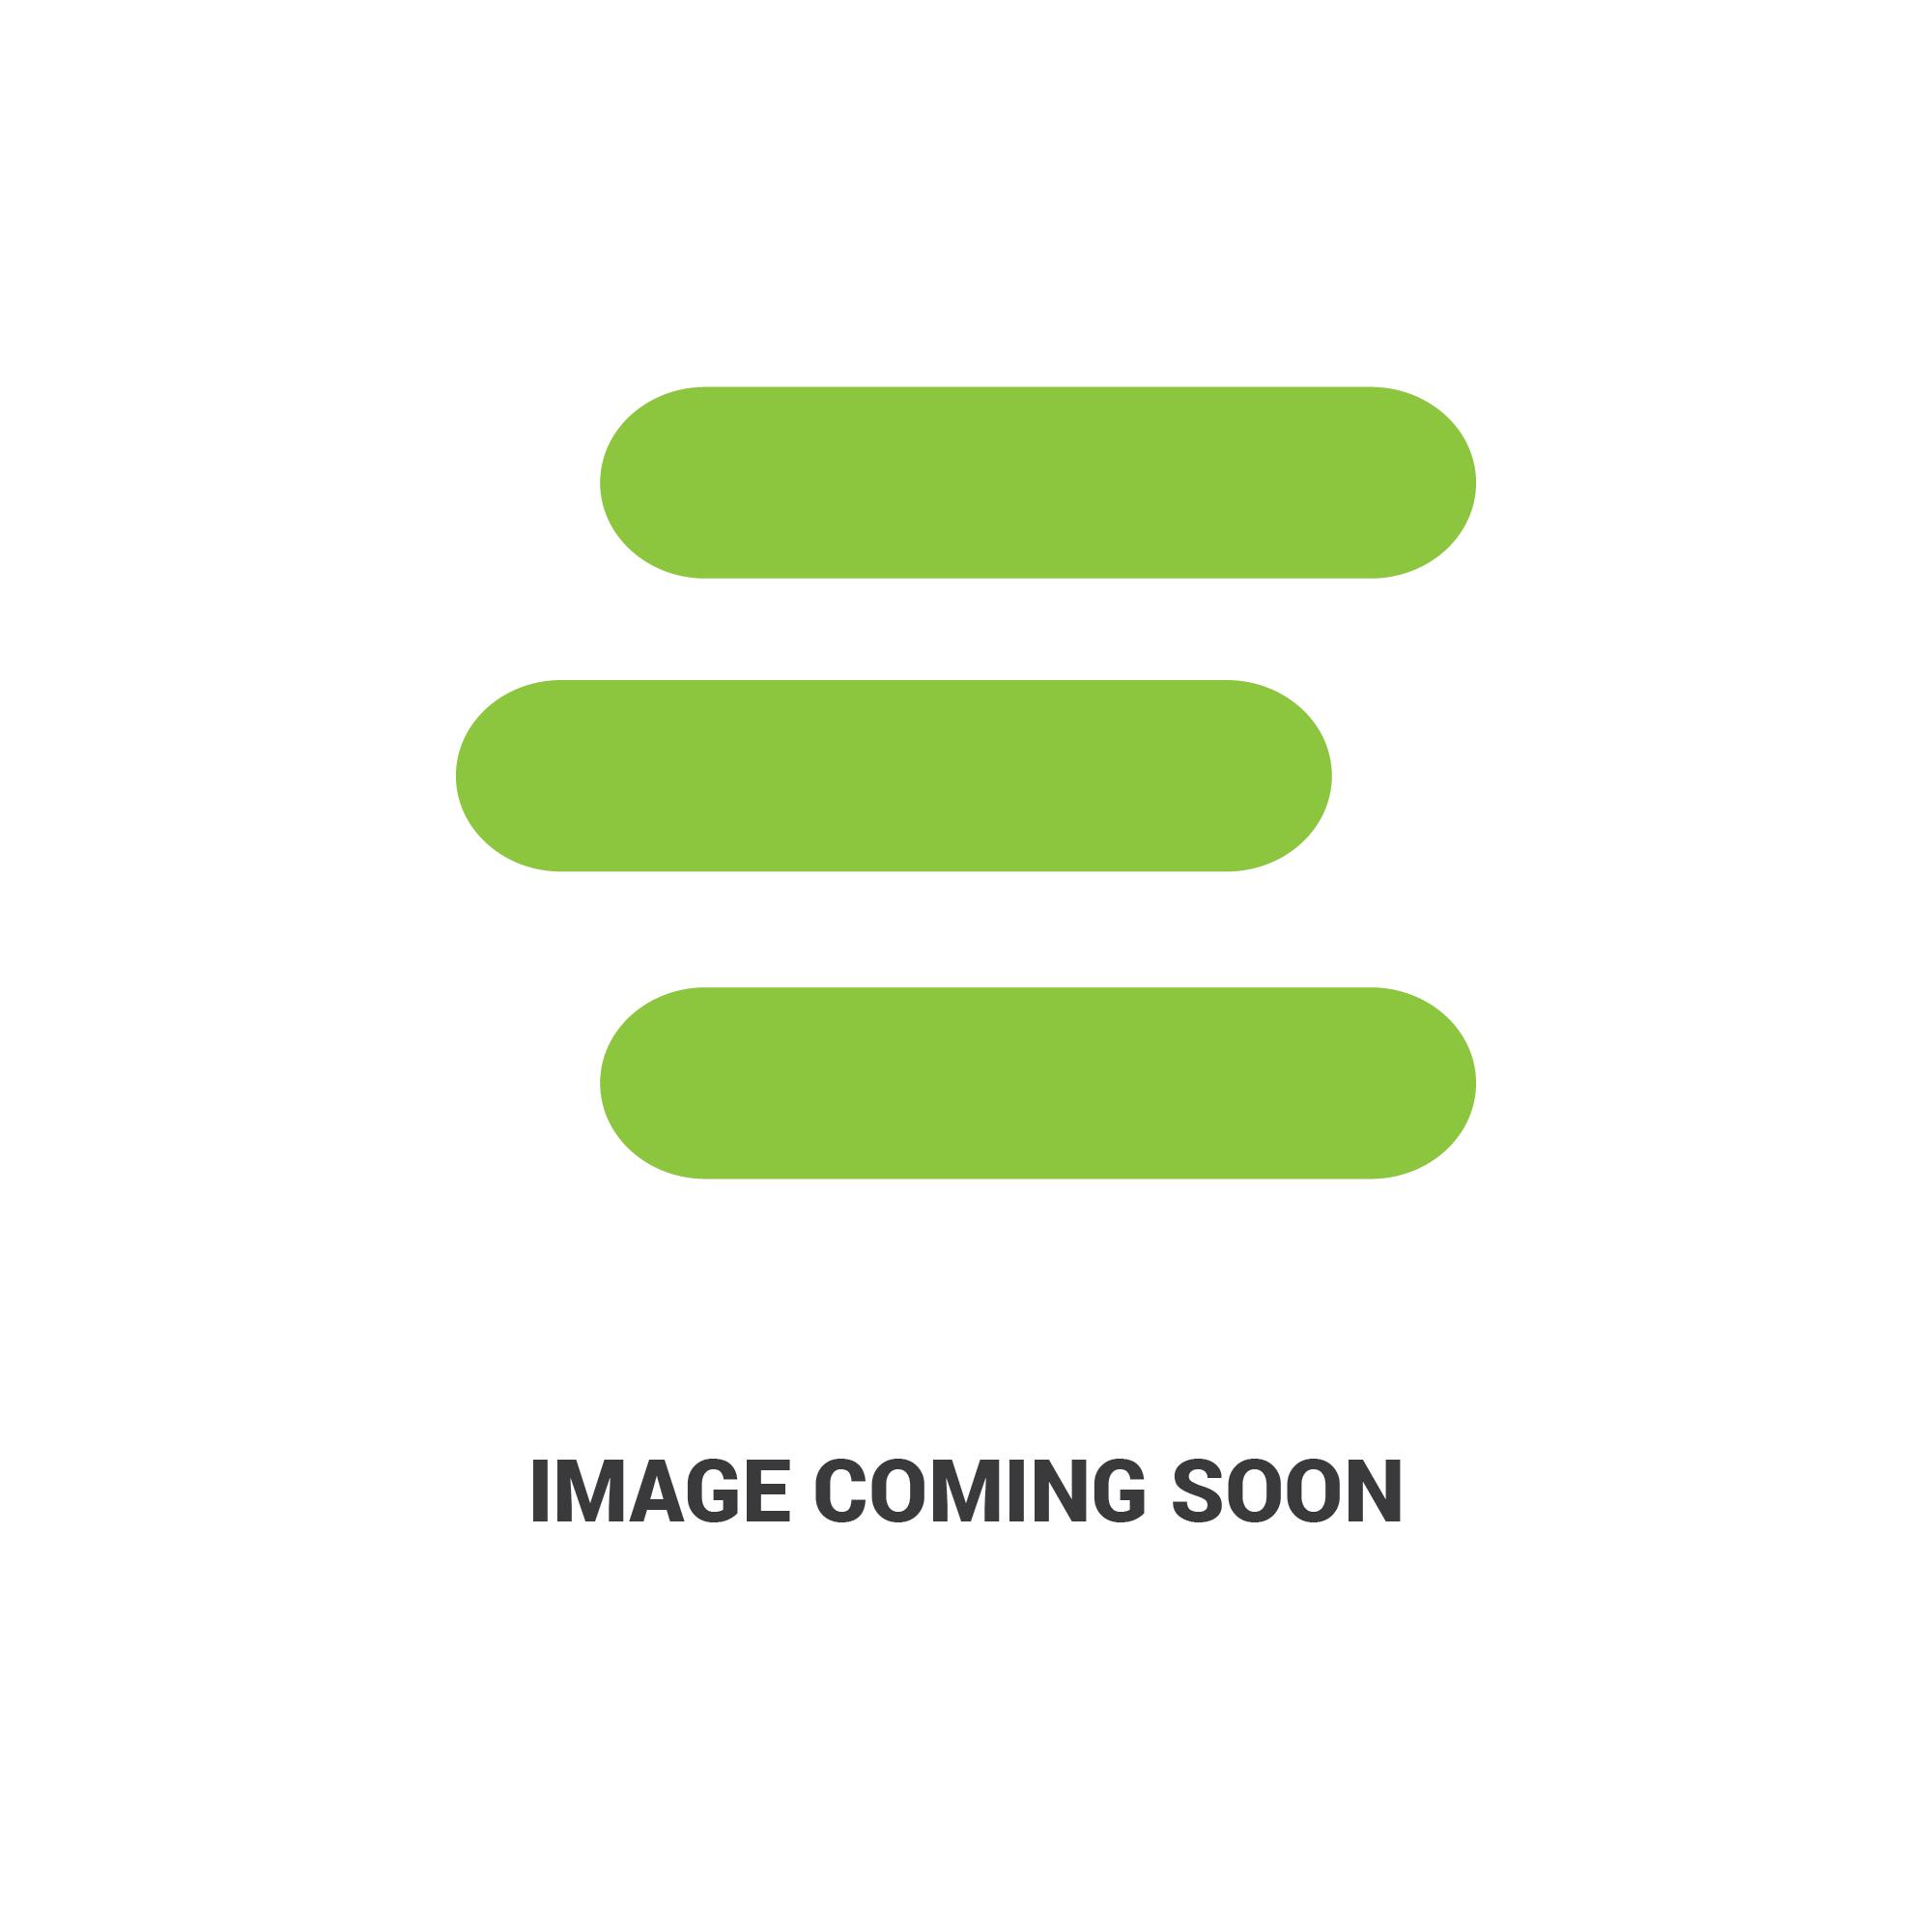 E-900.81.160edit 4.jpg